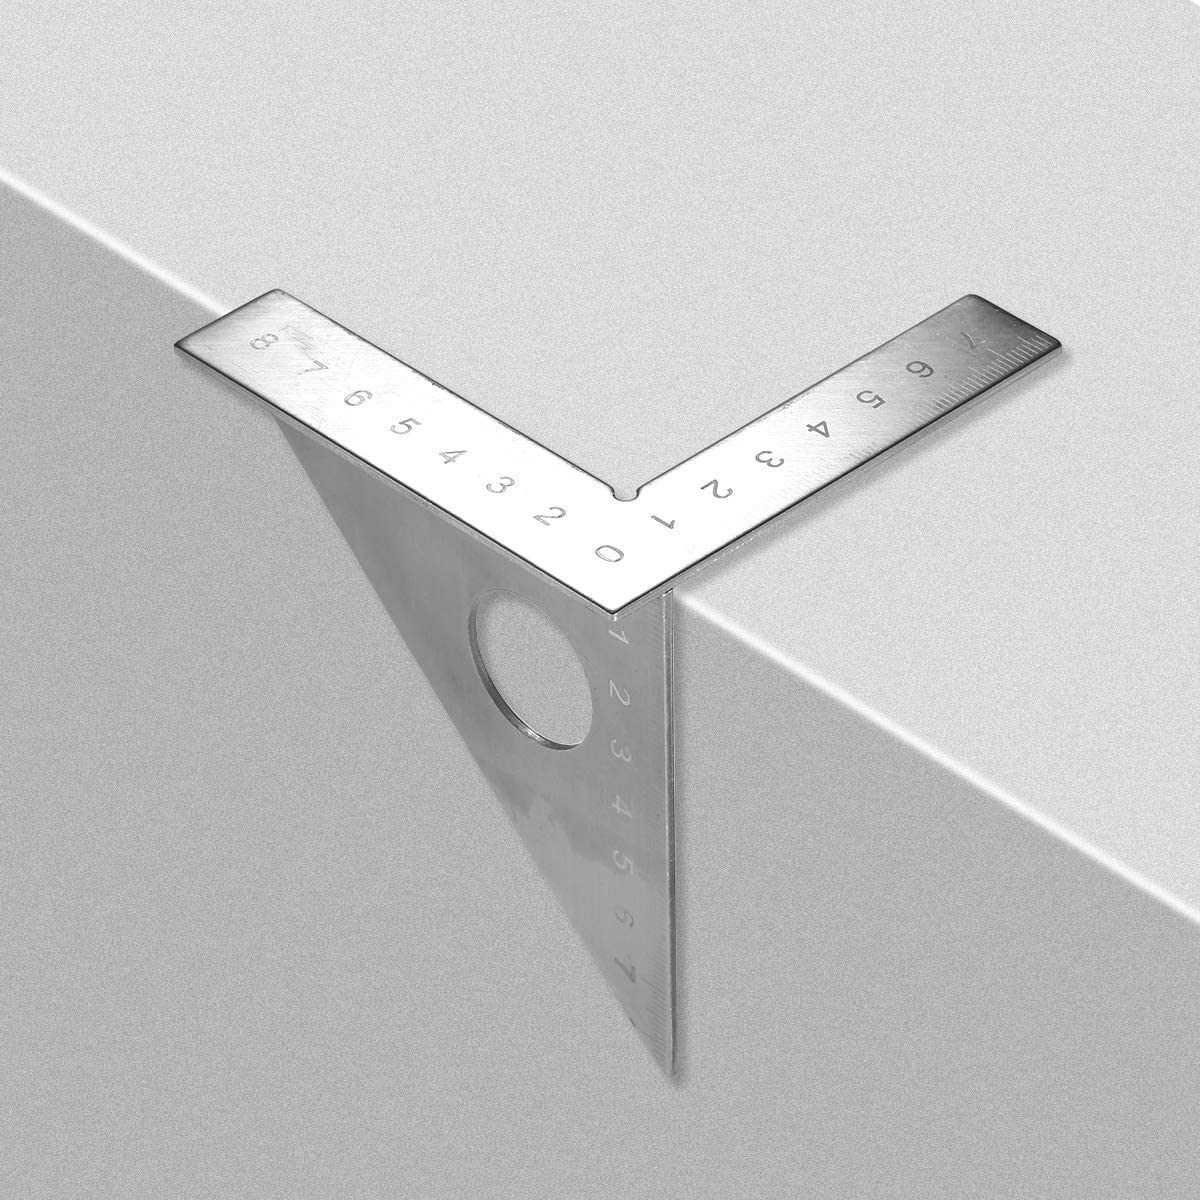 Woodworking Triangular Ruler Multi-functional Carpenters Rule 45/° 90/° Angle Square Angle Rule Mark Scraper Carpenters Marking Tool Three Edged Rule